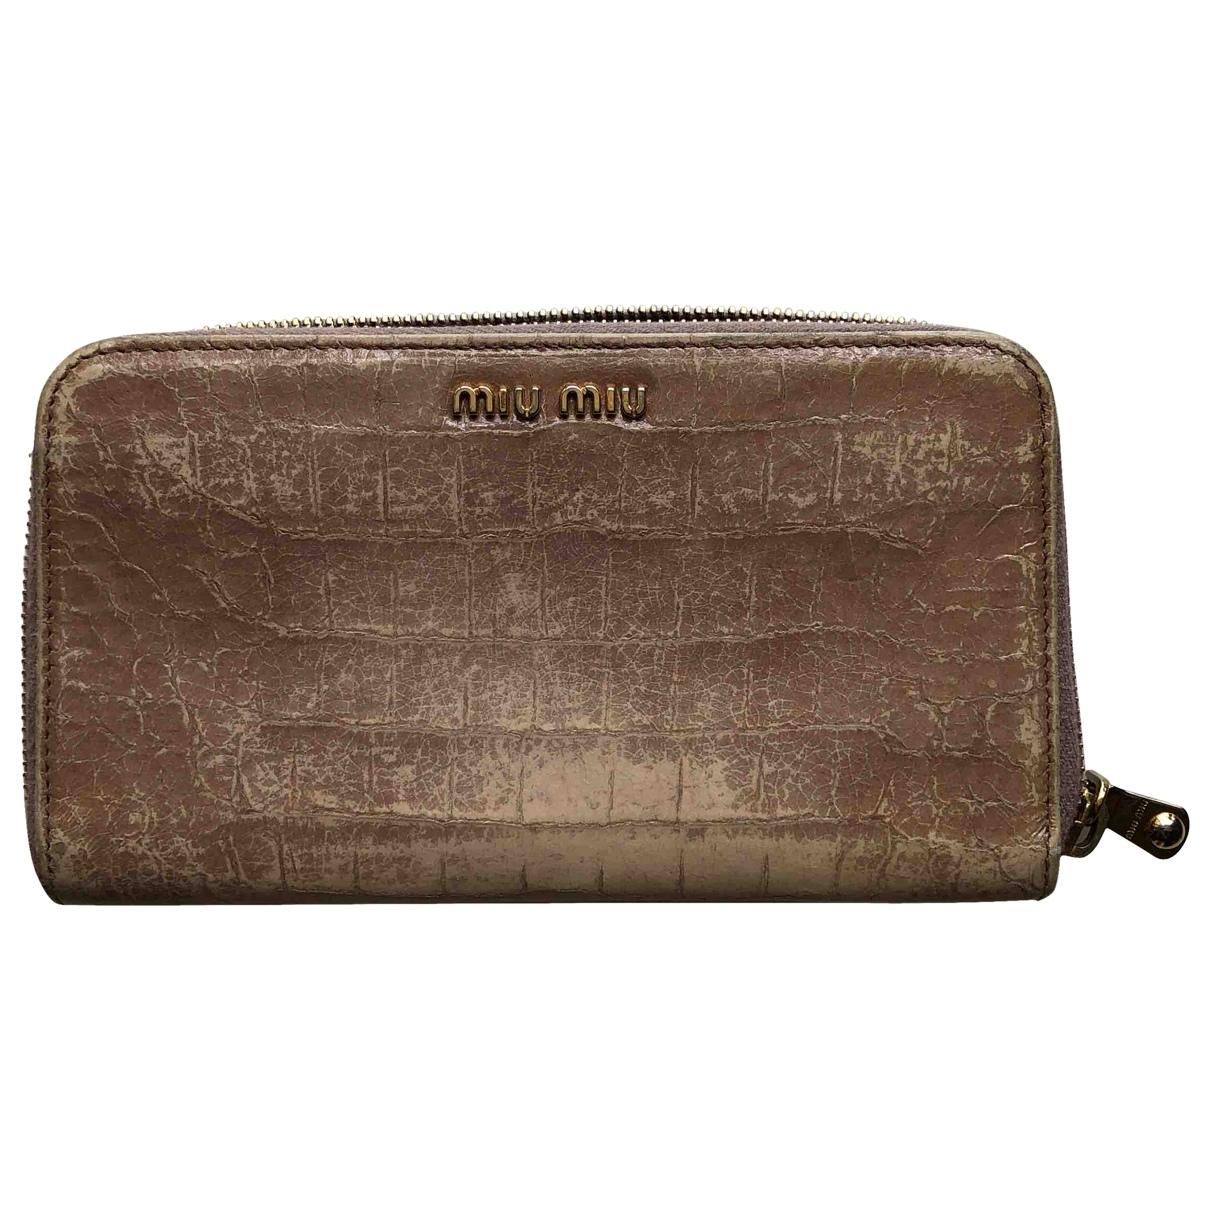 Miu Miu \N Pink Patent leather wallet for Women \N